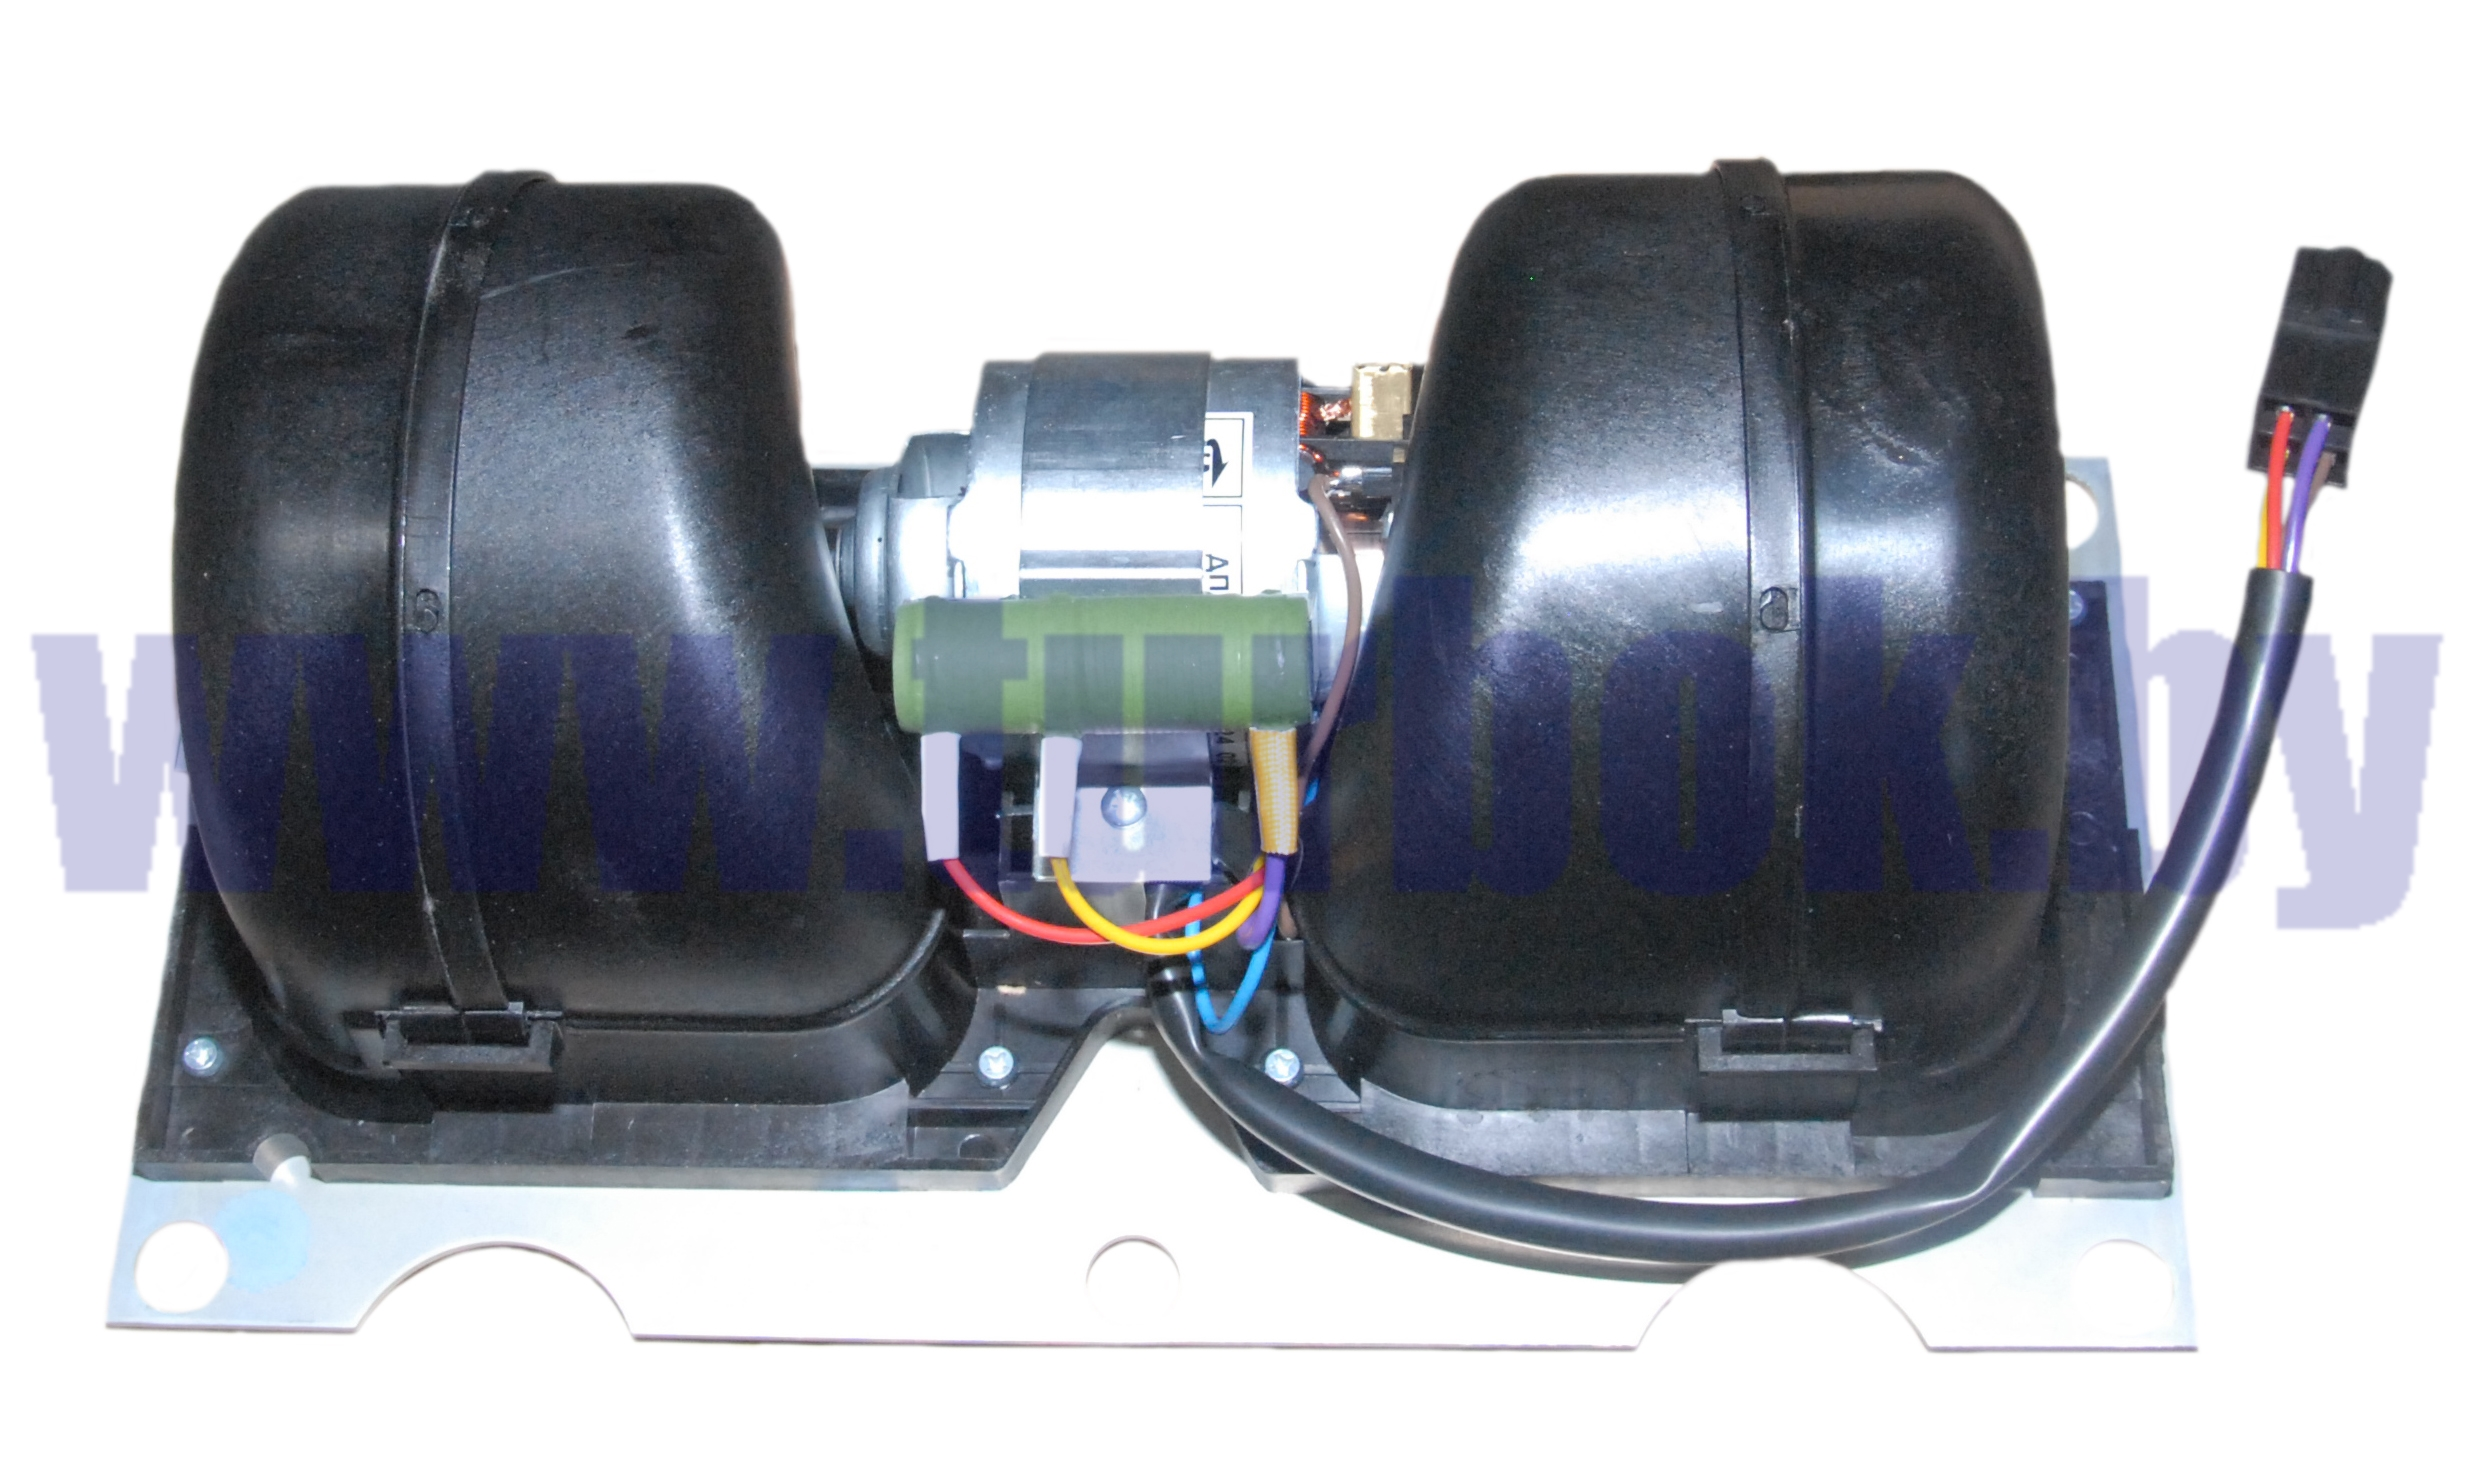 Блок вентиляторный отопителя (на 2 улитки) МАЗ-4370, 650119/ИЖКС.632546.004-04